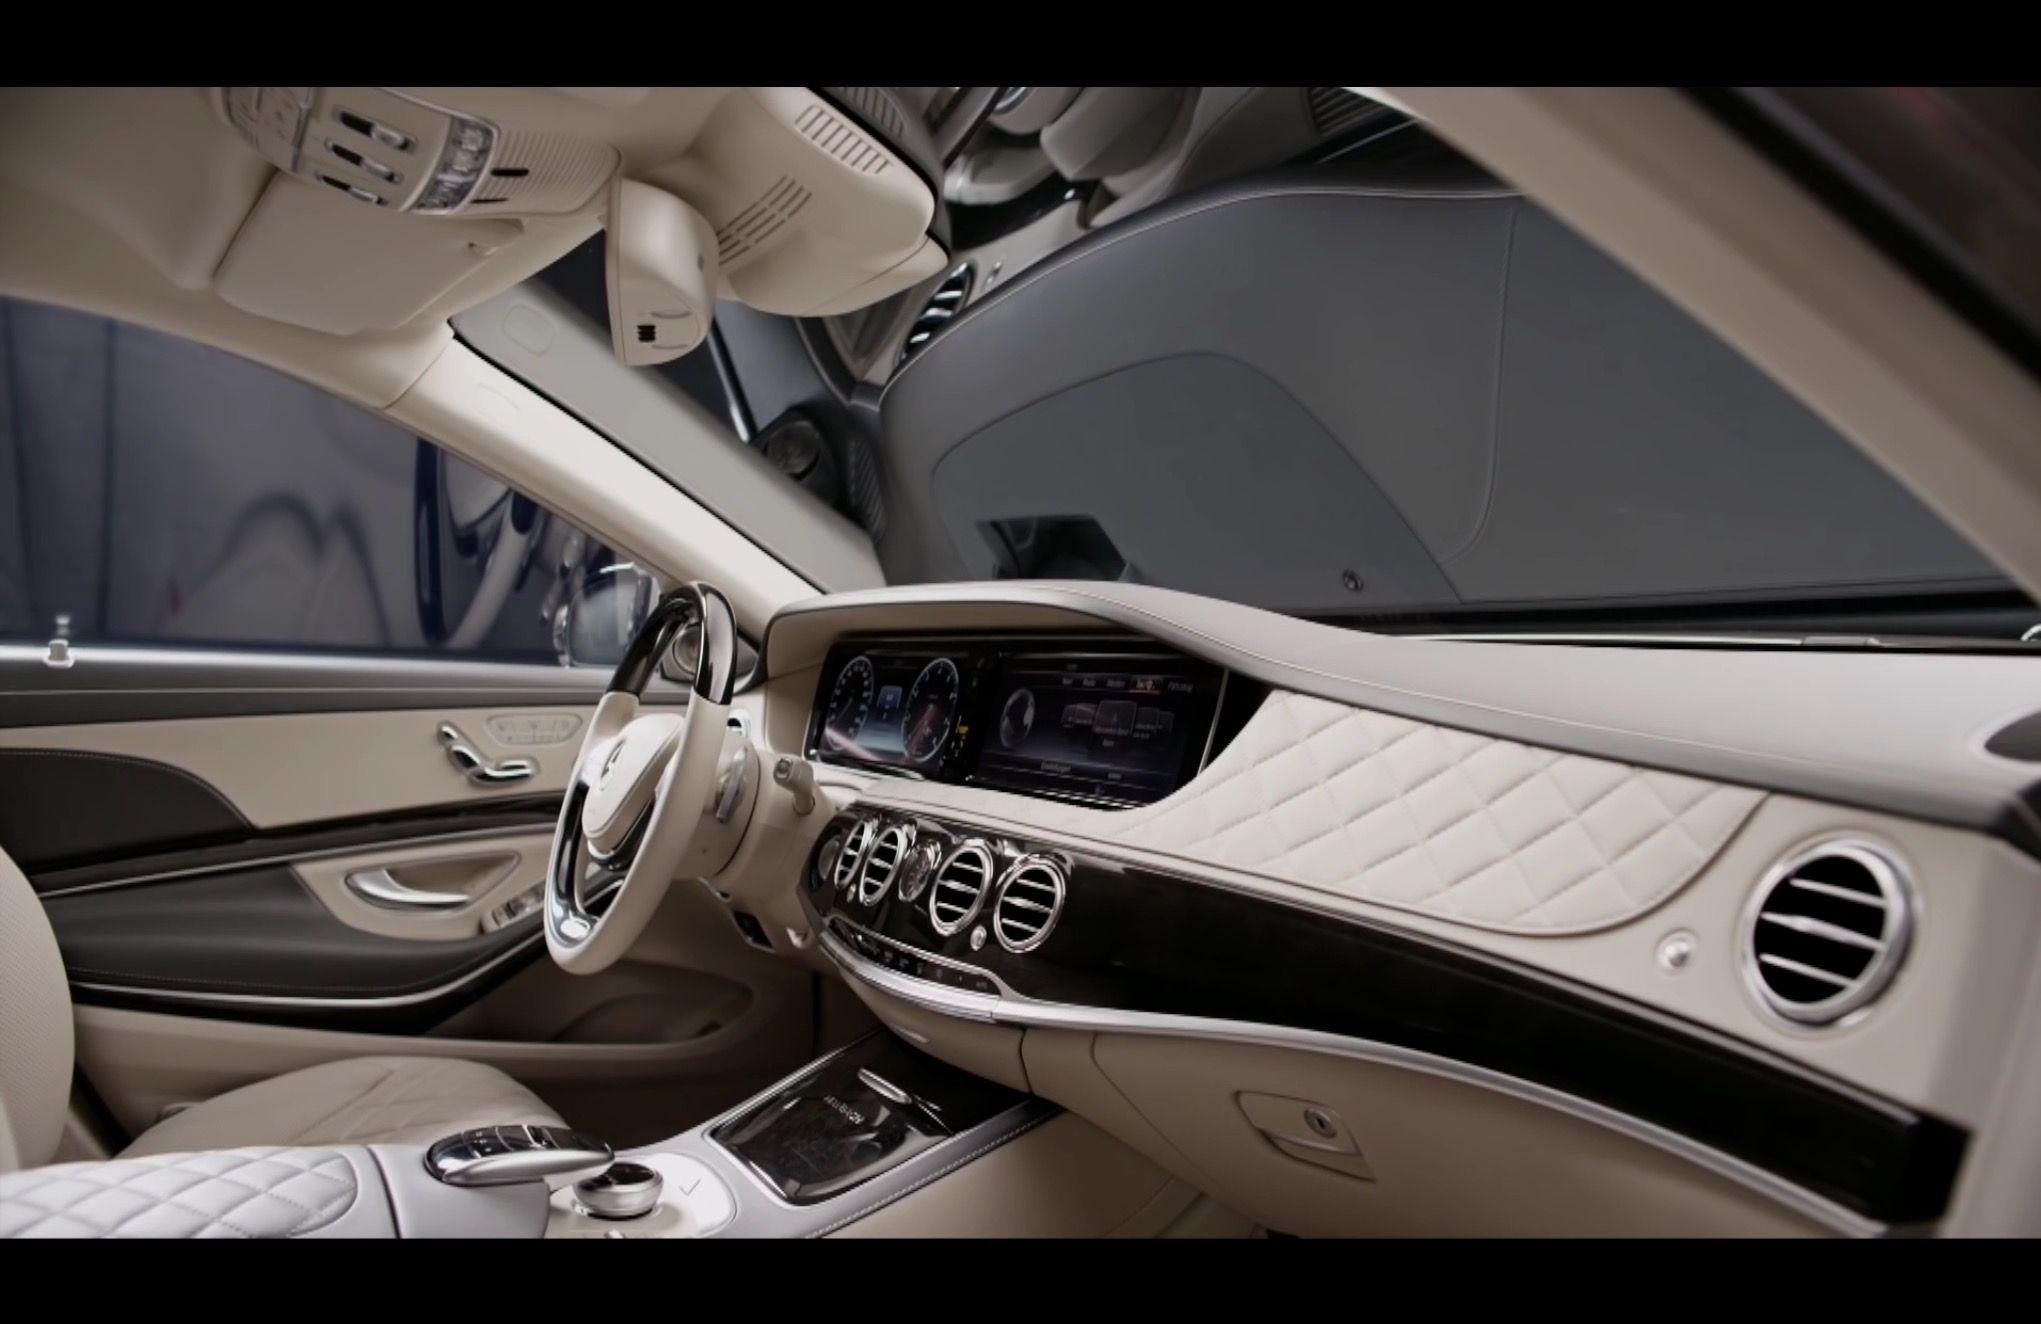 Interior.... Mercedes-Maybach S600 Pullman | Mercedes maybach s600, Mercedes maybach, Maybach